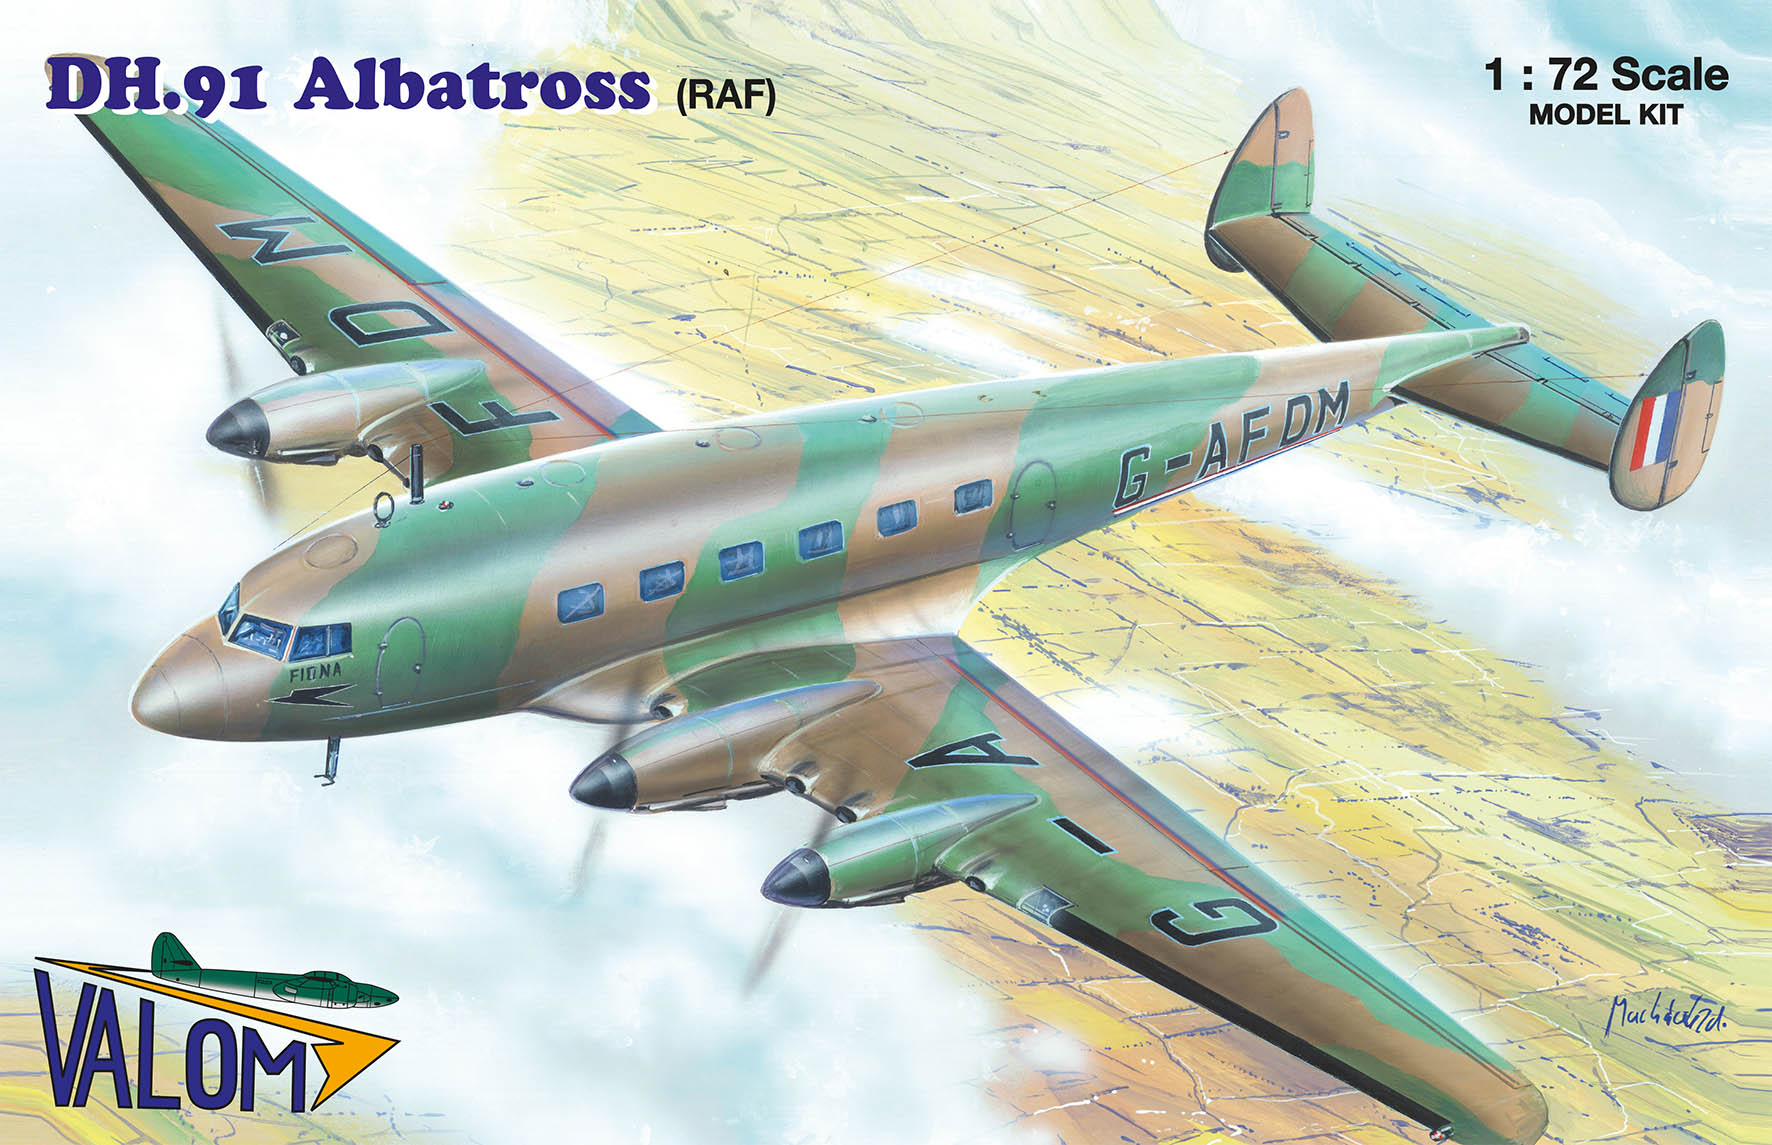 Valom DH.91 Albatross (RAF)